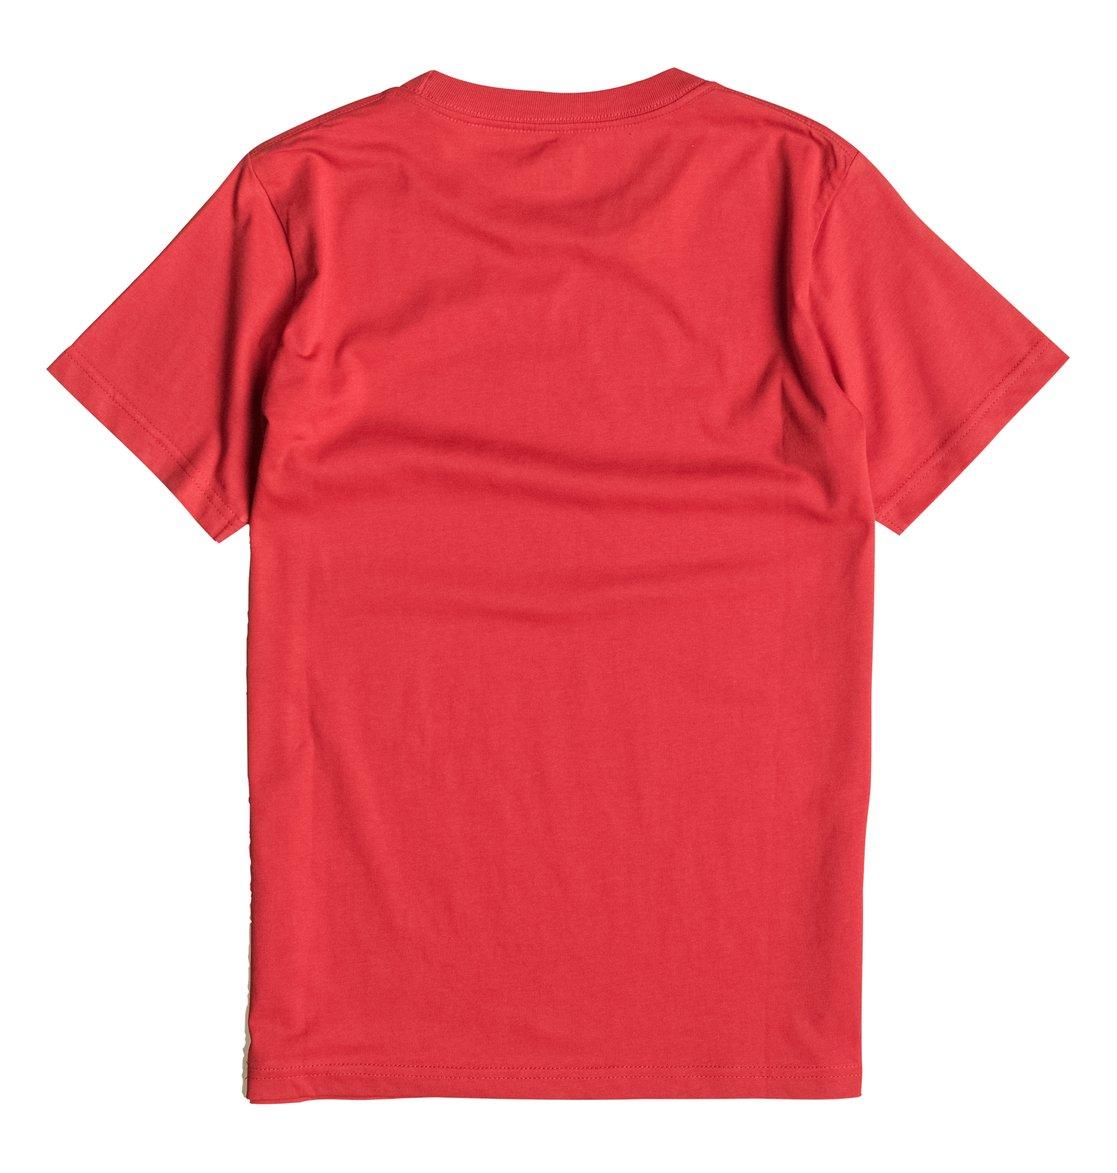 Shred mint t shirt 3613371332020 dc shoes for Mint color t shirt